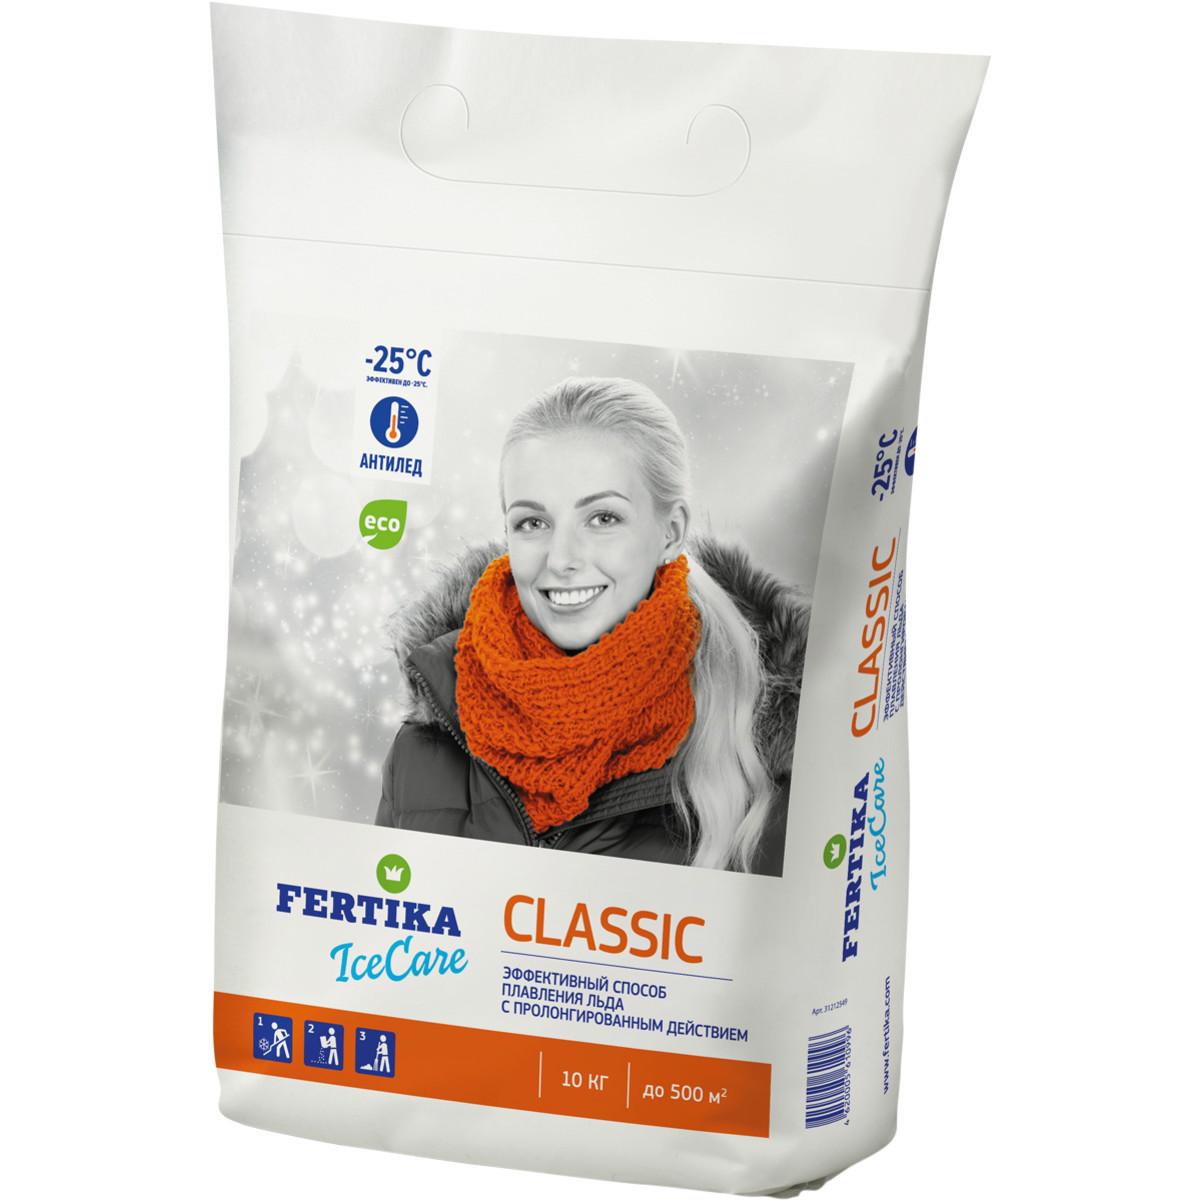 Противогололедный реагент Фертика icecare classic 10 кг